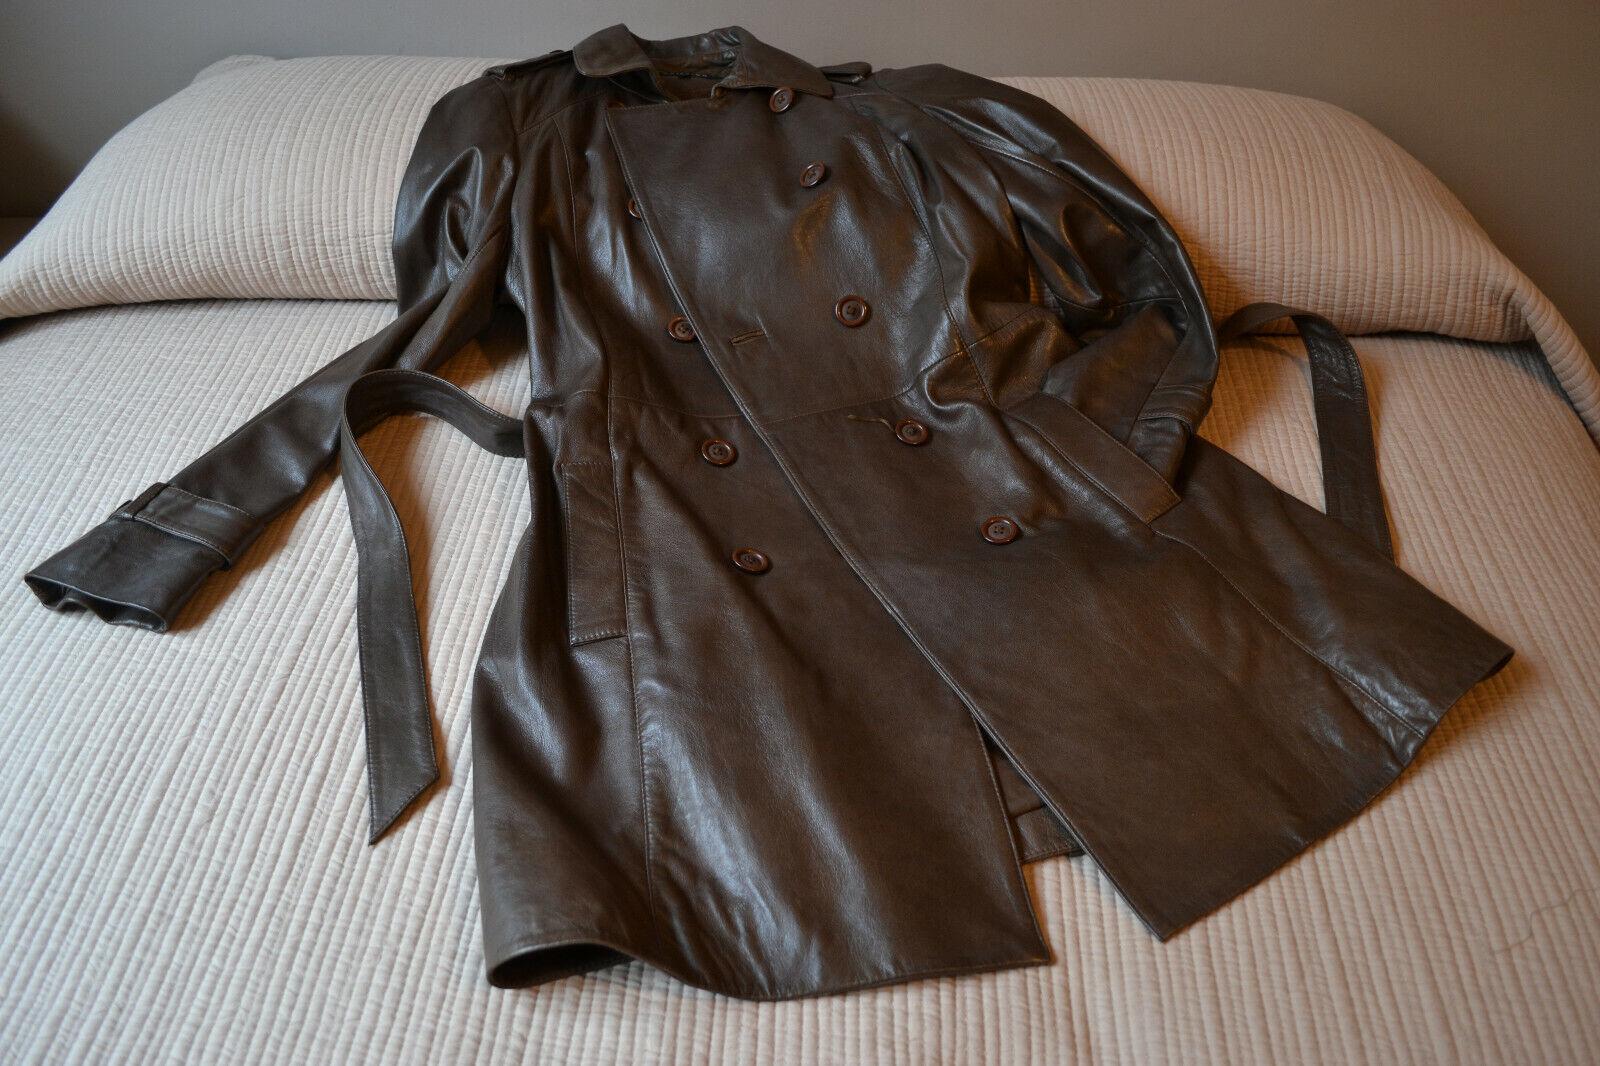 Superbe trench coat en cuir (marque debriefing) - agneau glacé marron - neuf